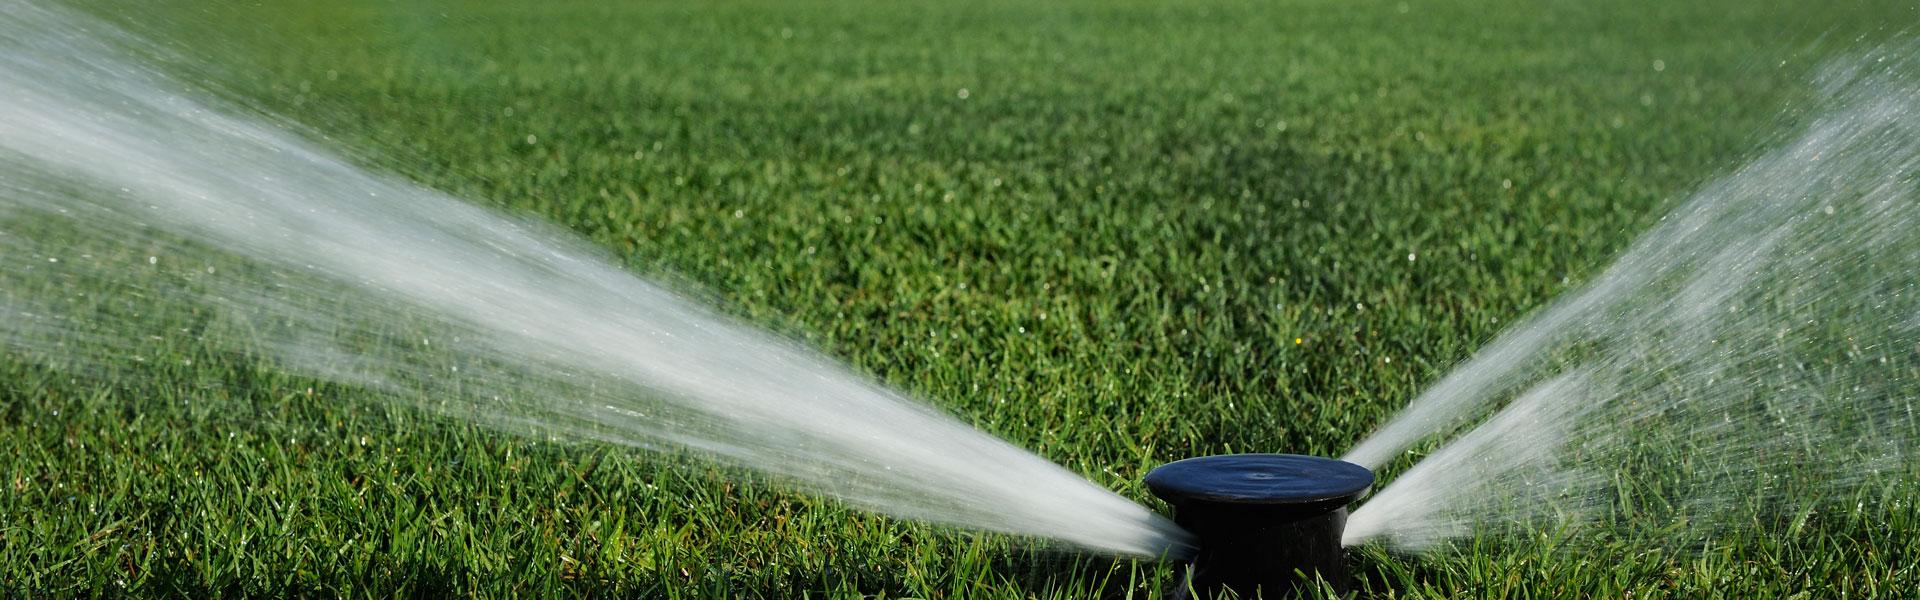 Turfmanzi Irrigation Slider